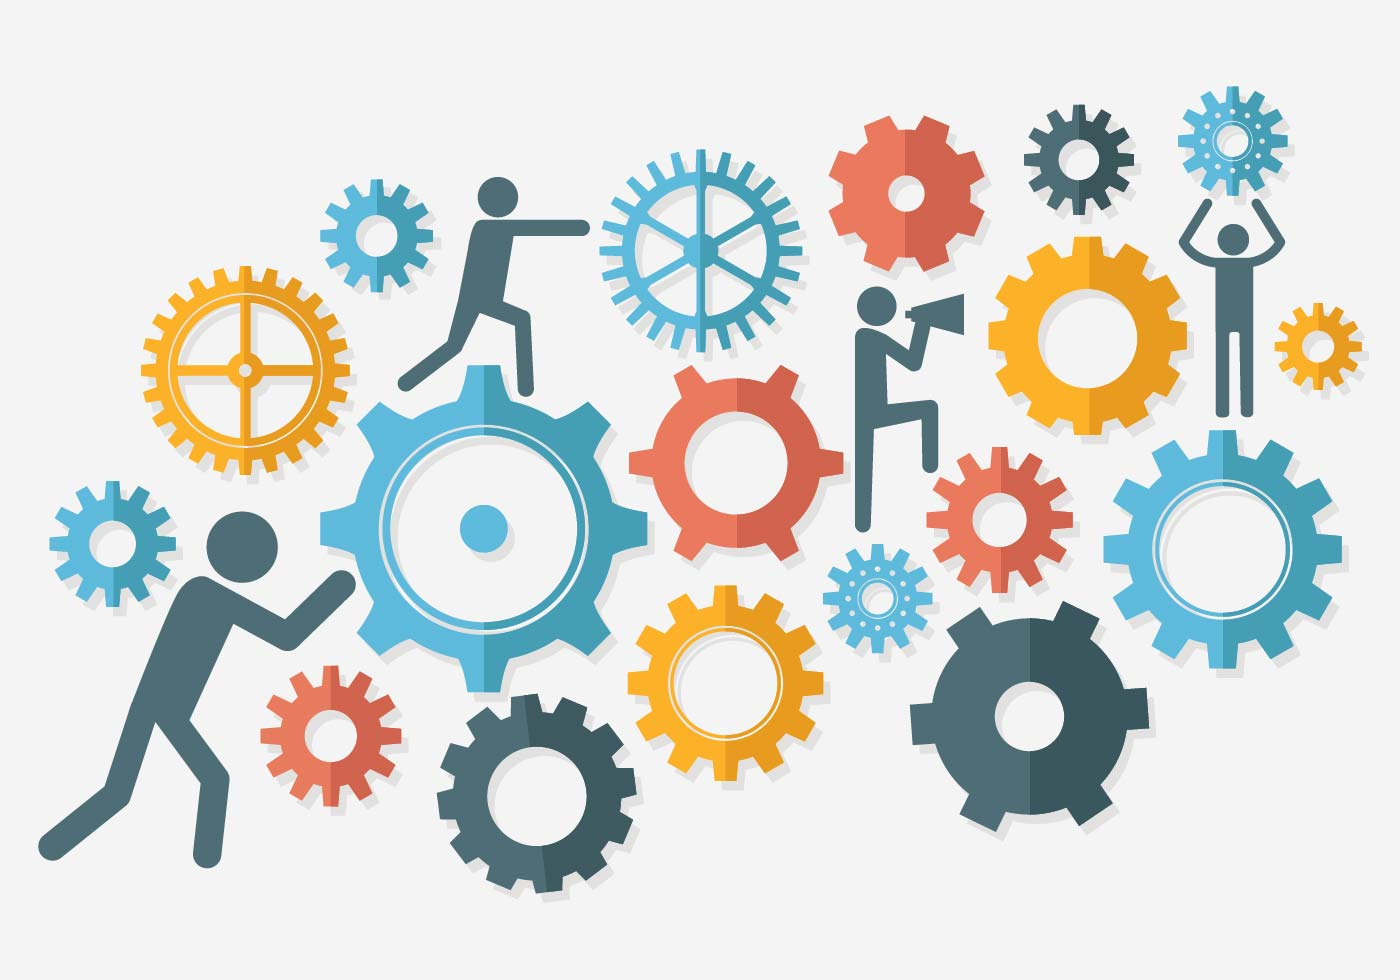 Free Working Together Illustration Vector Download Free